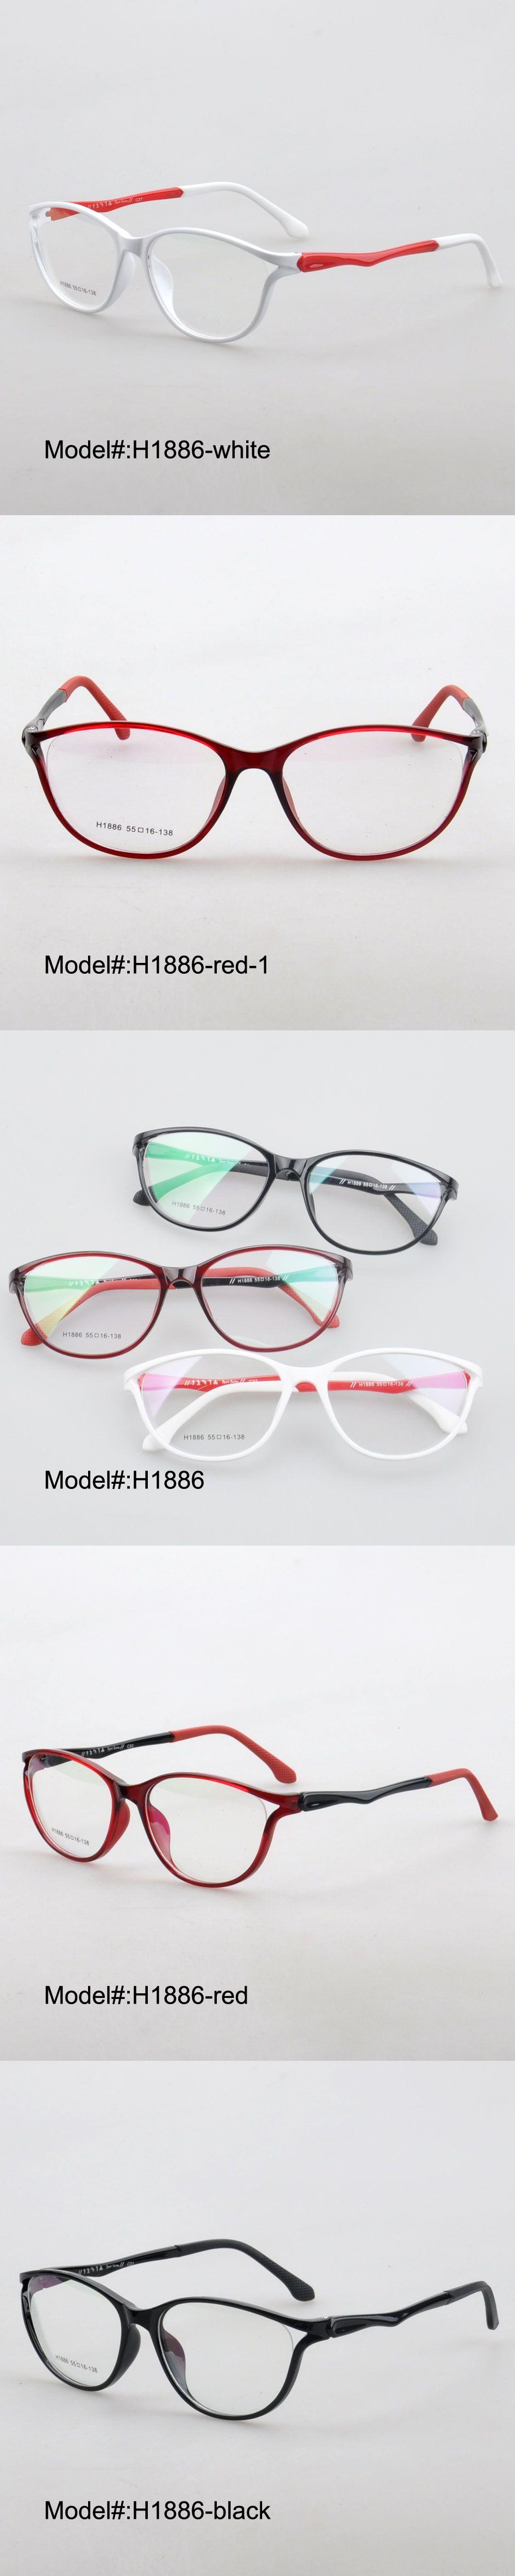 b4c2f4fe2e MY DOLI New arival H1886 full rim vintage unisex TR myopia eyewear  eyeglasses prescription spectacles optical